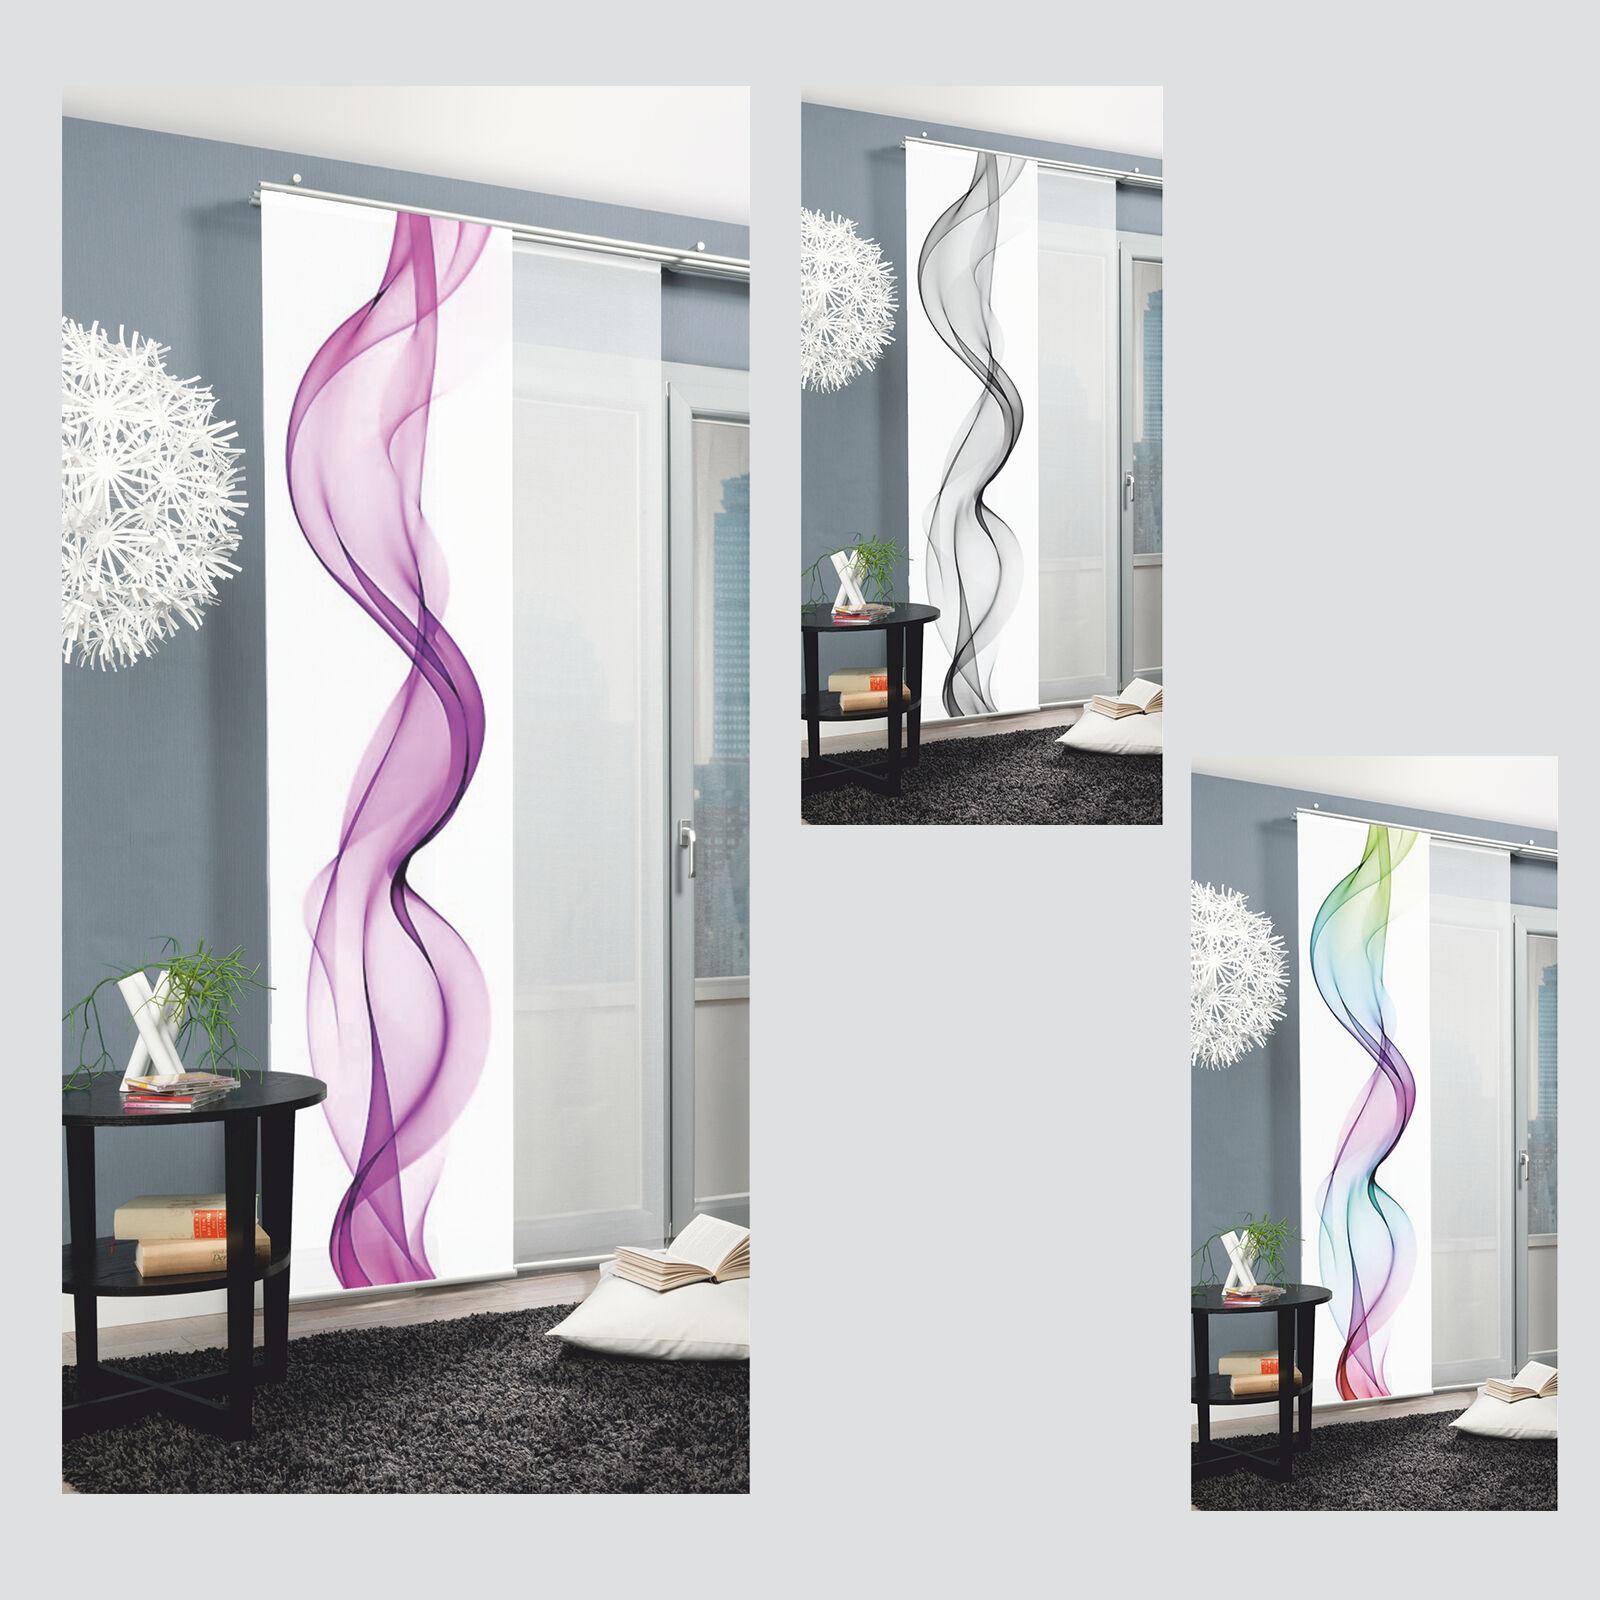 edmonton l300 cm panel curtains room divider home wohnideen